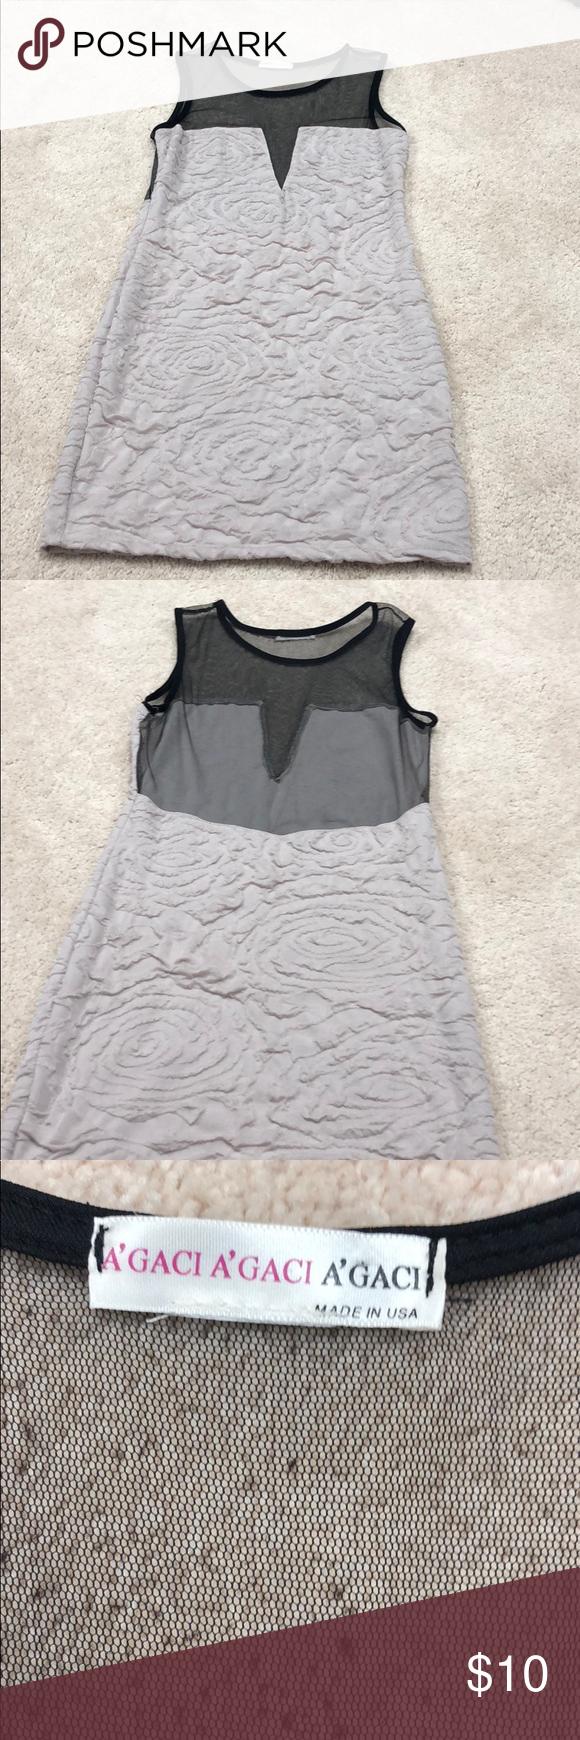 Beige and mesh dress